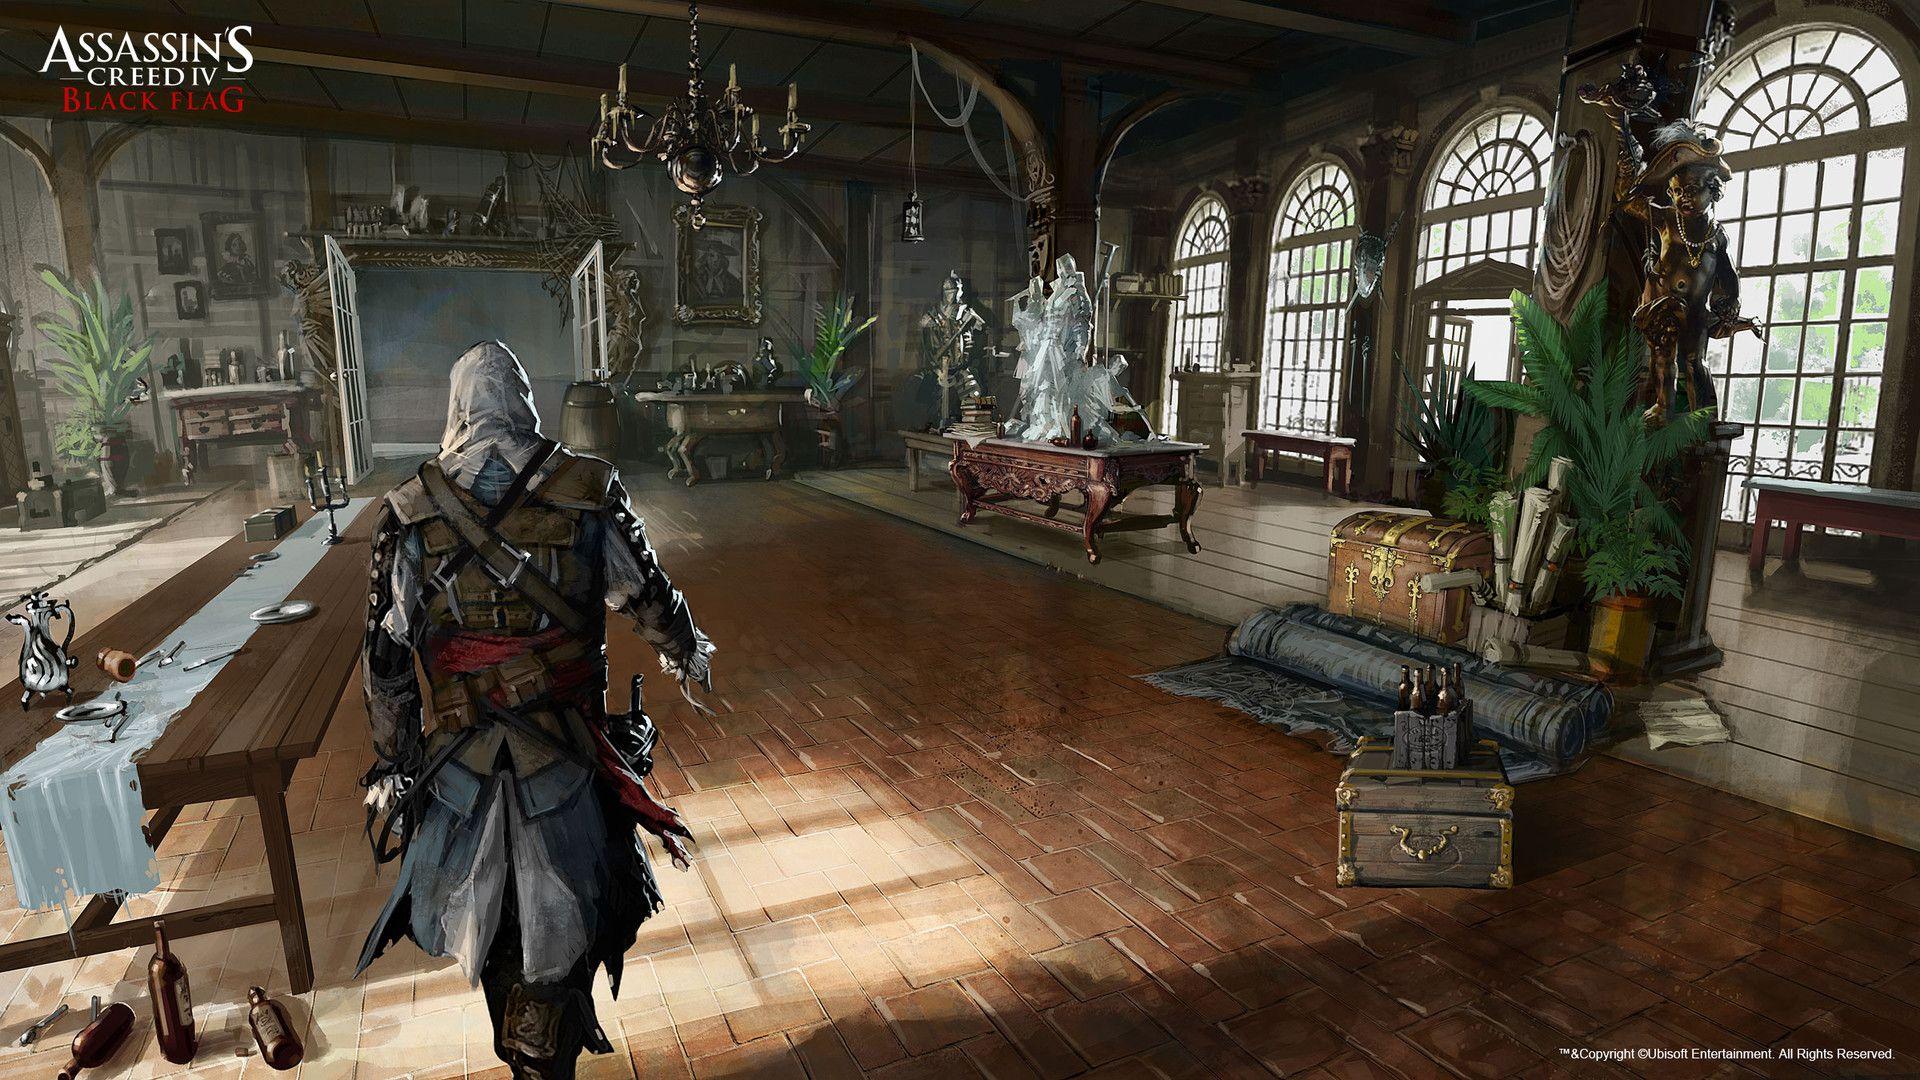 Artstation Assassin S Creed Black Flag Grant Hillier With